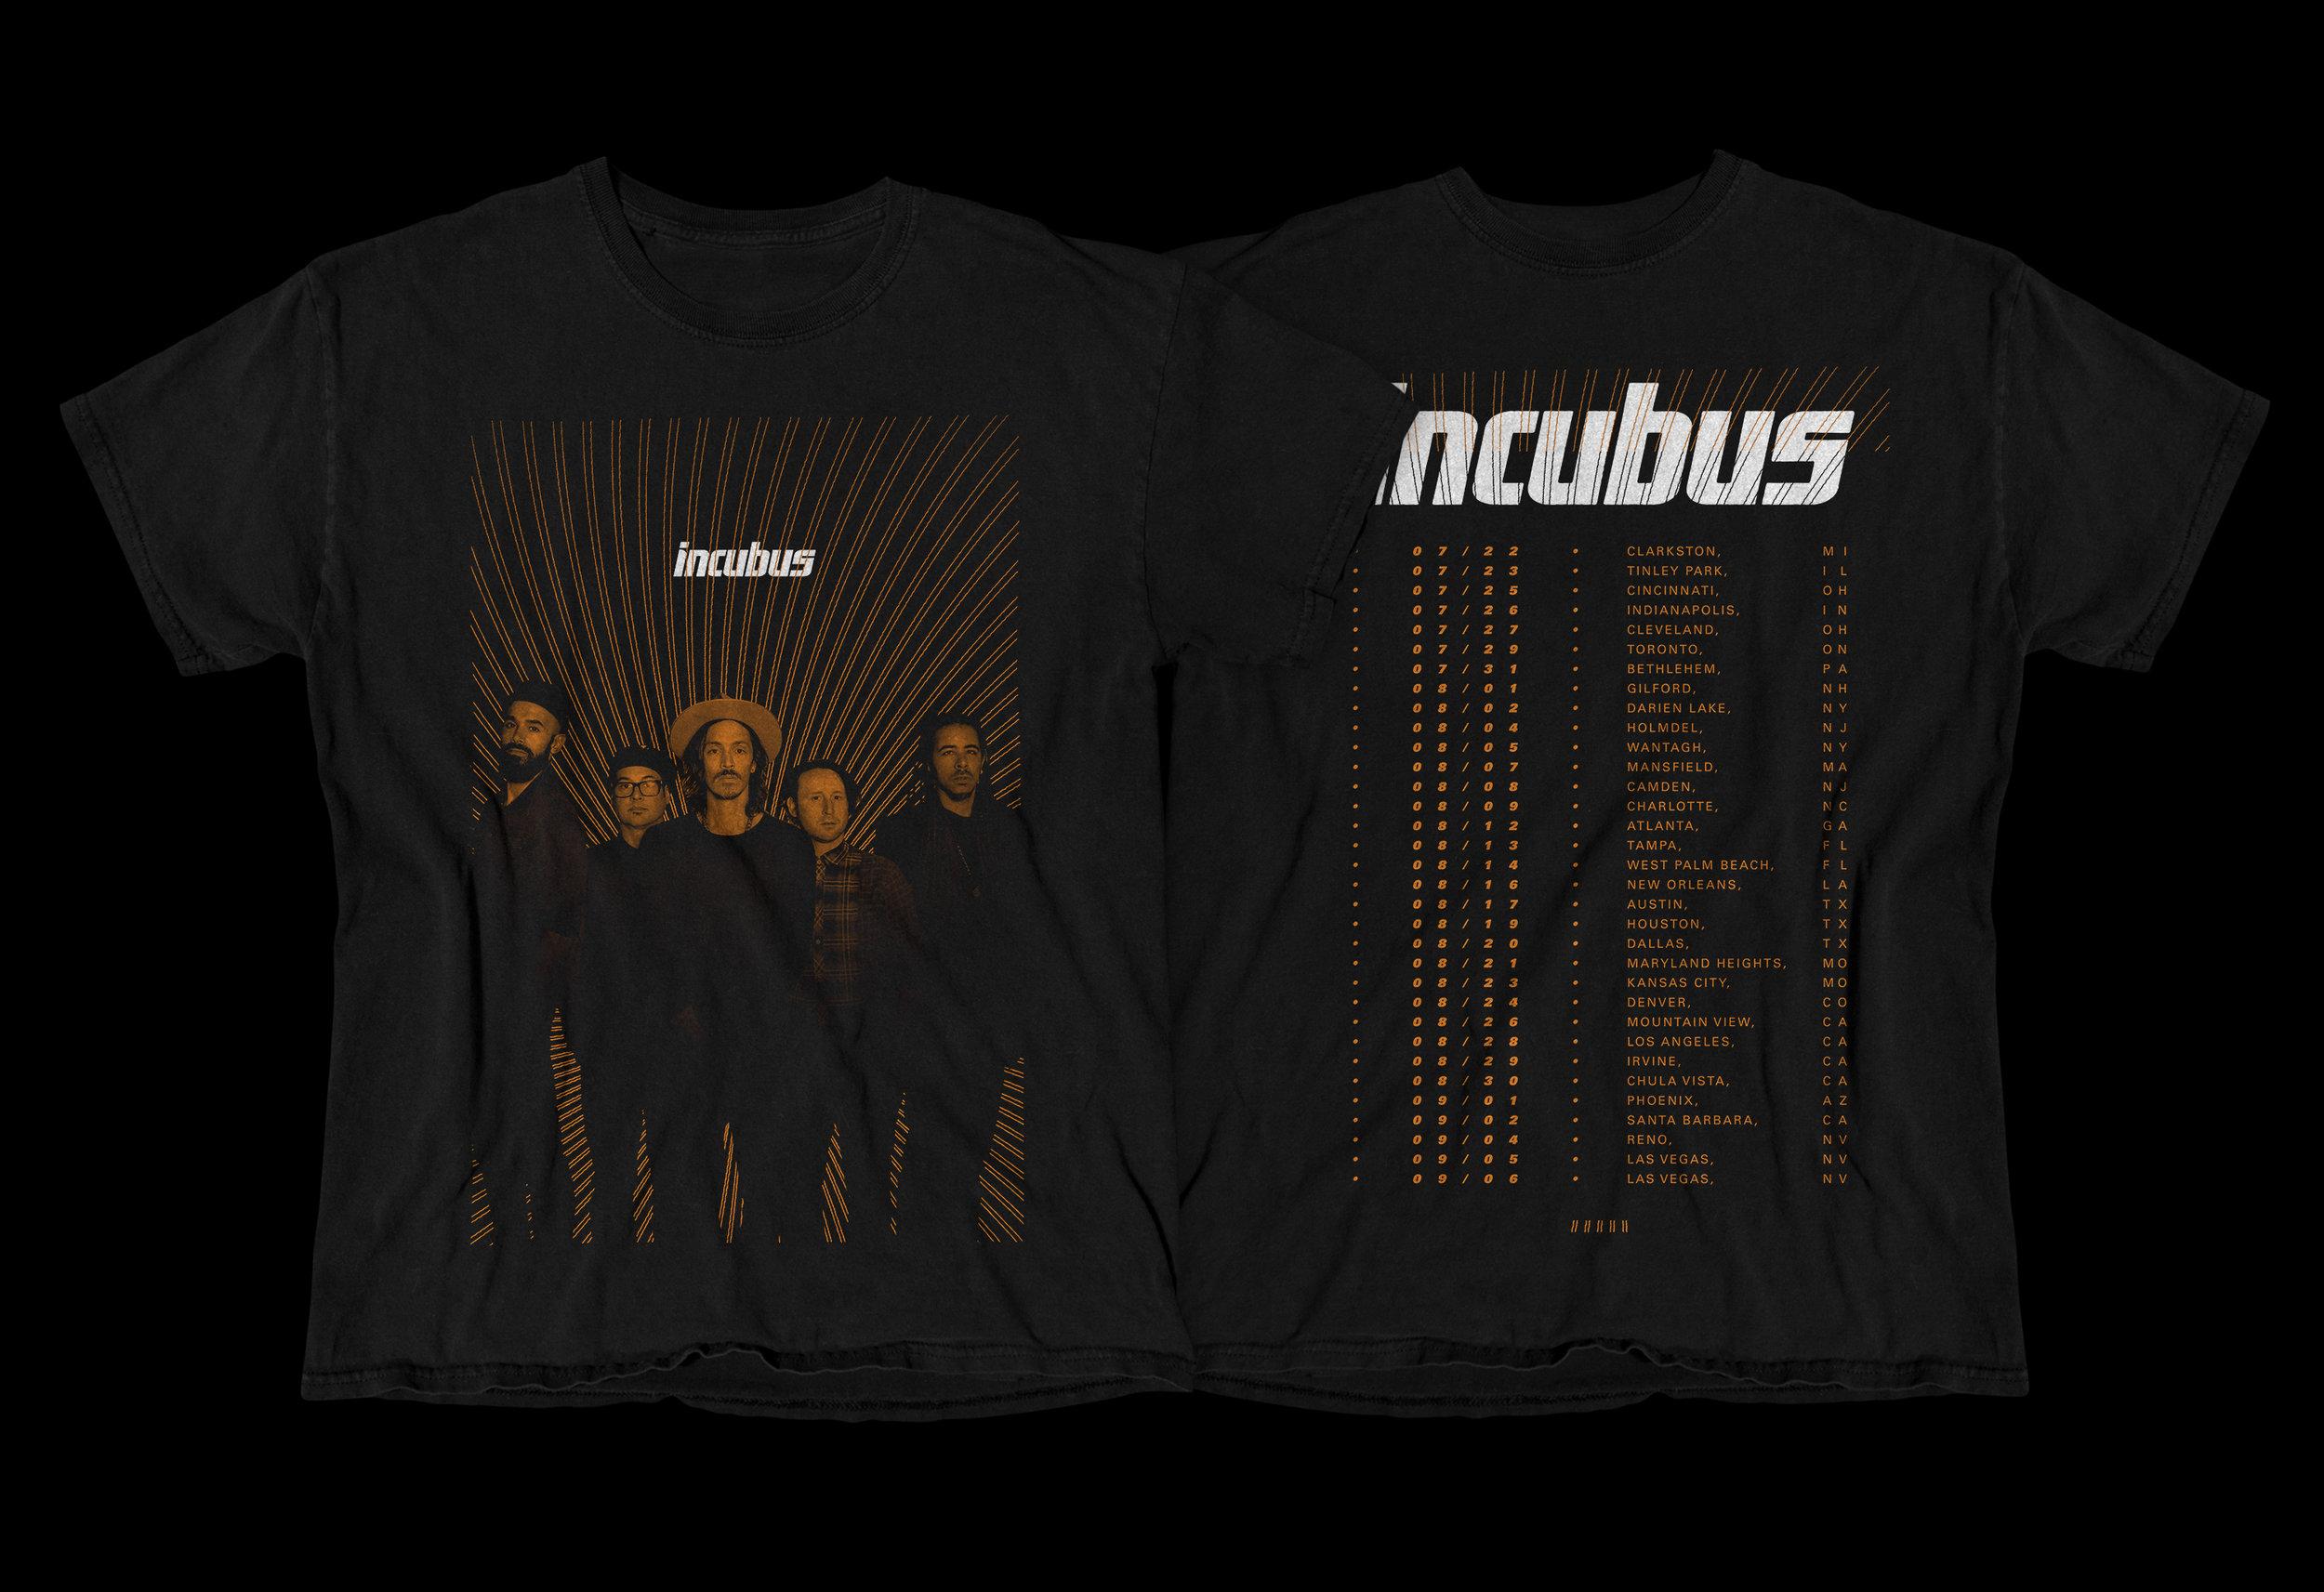 INCUBUS_TOUR_1.jpg